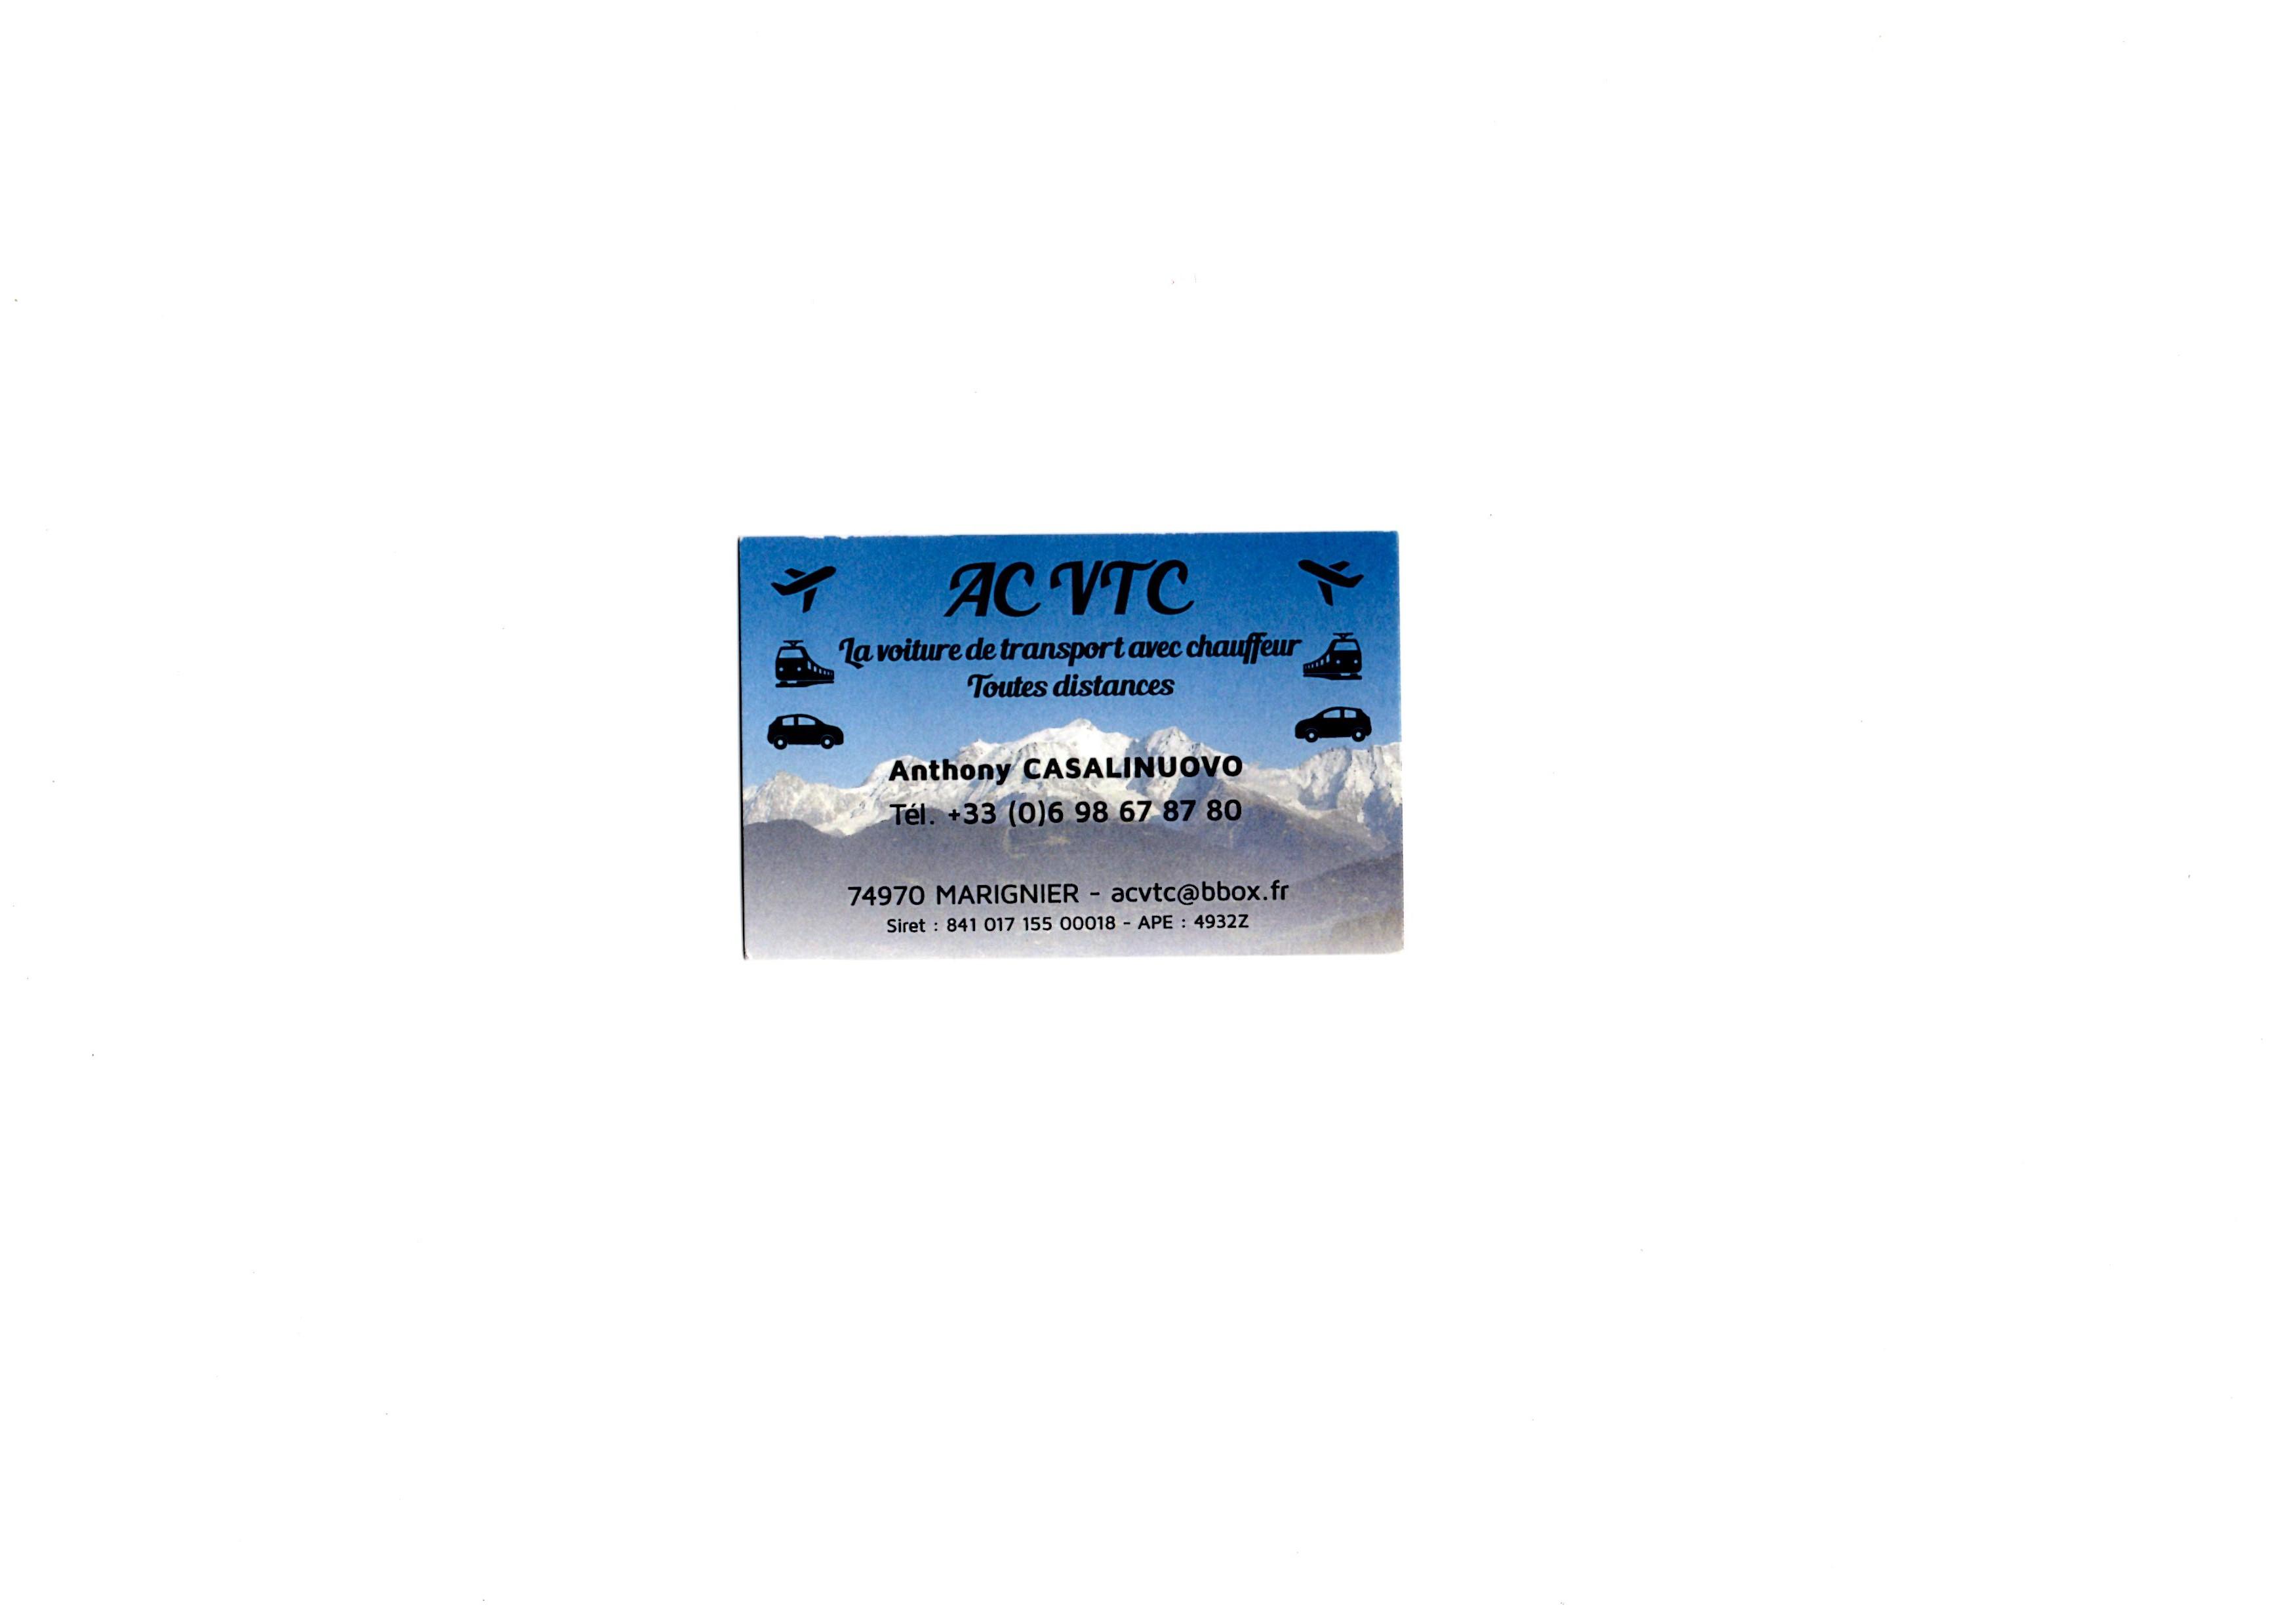 ACVTC anthony casalinuovo Services aux entreprises